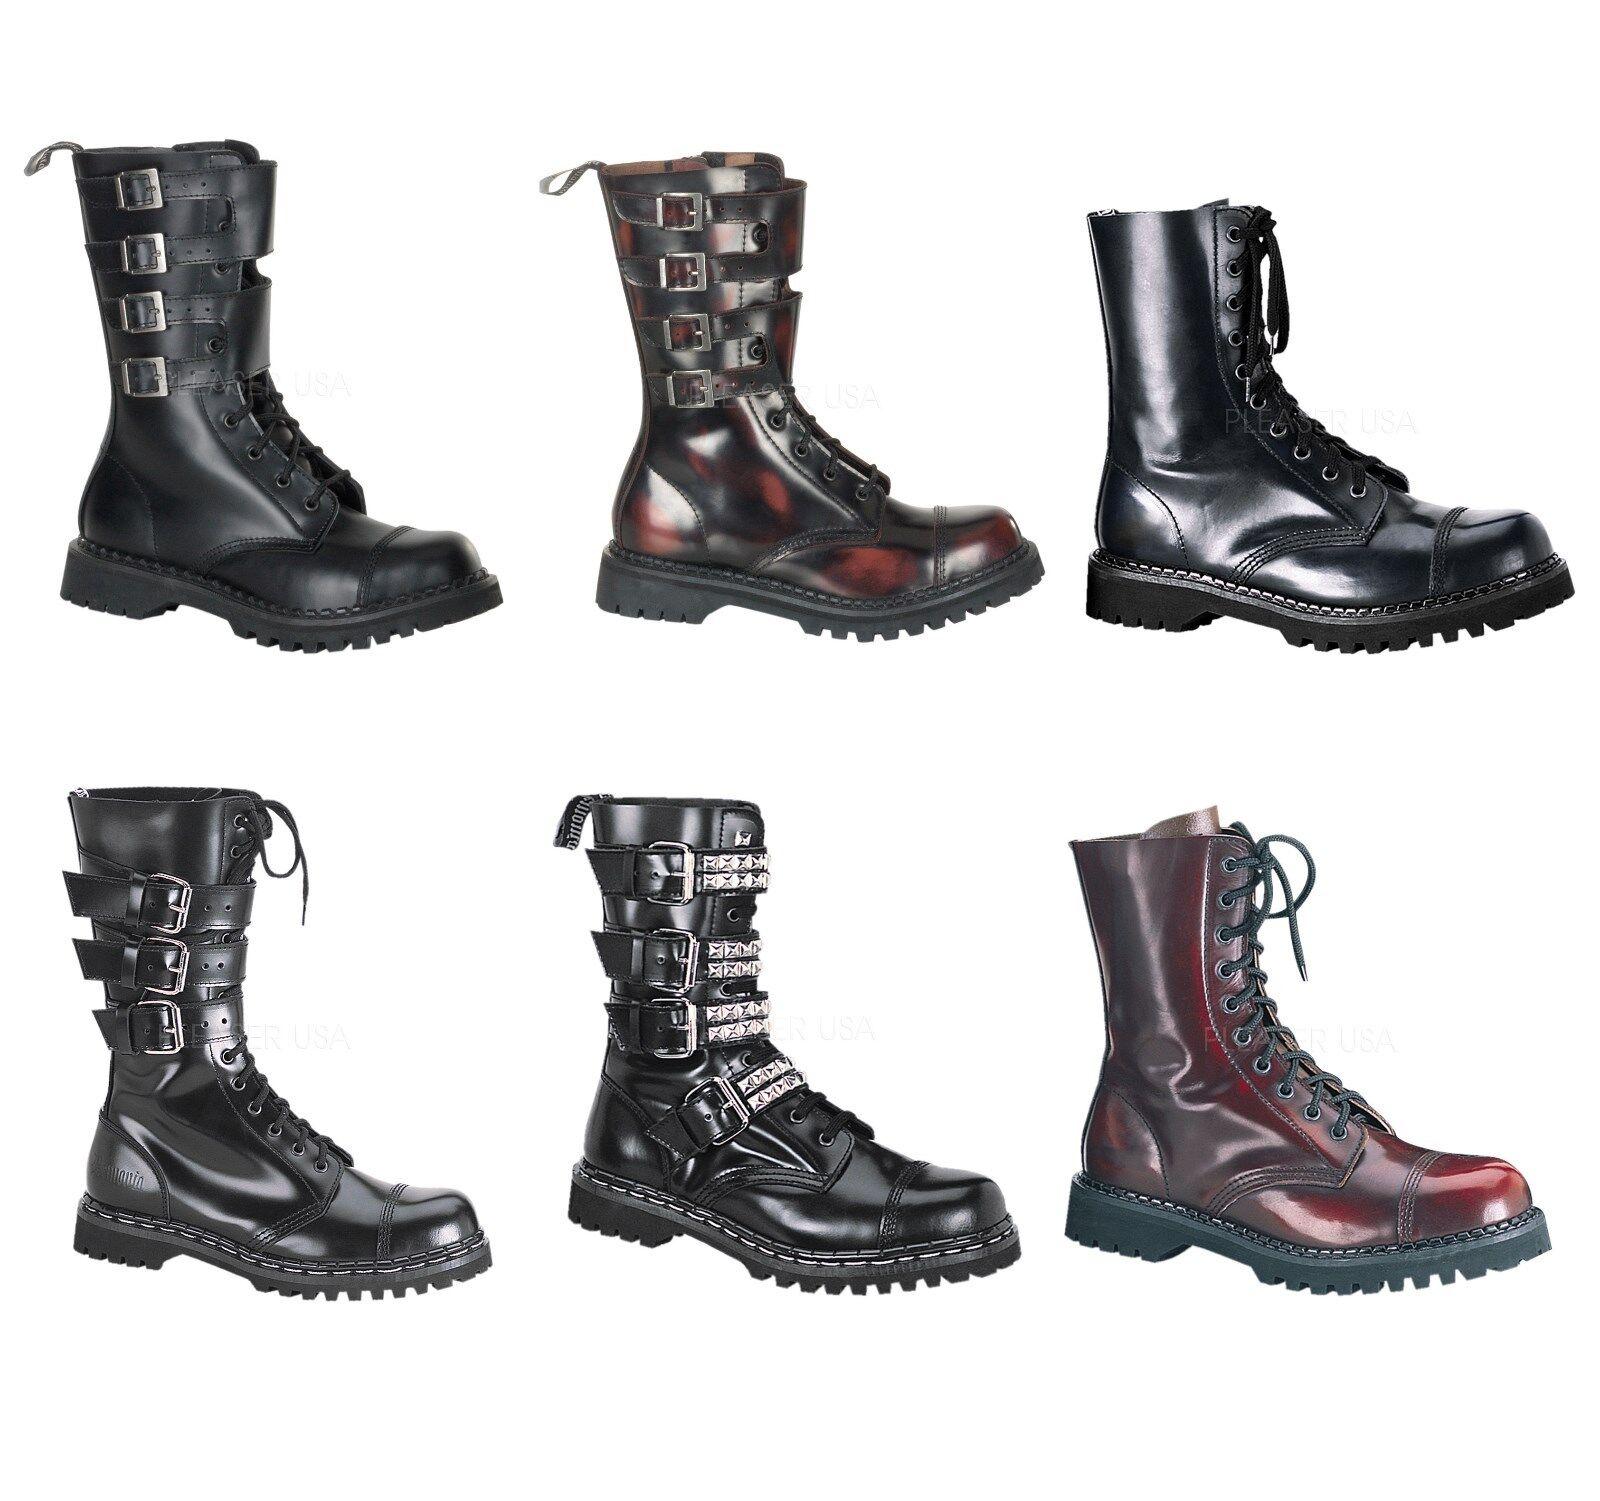 DEMONIA Men's Leather Steel Toe Calf Boot Attack-10 Gravel-10S 14 Rocky-10